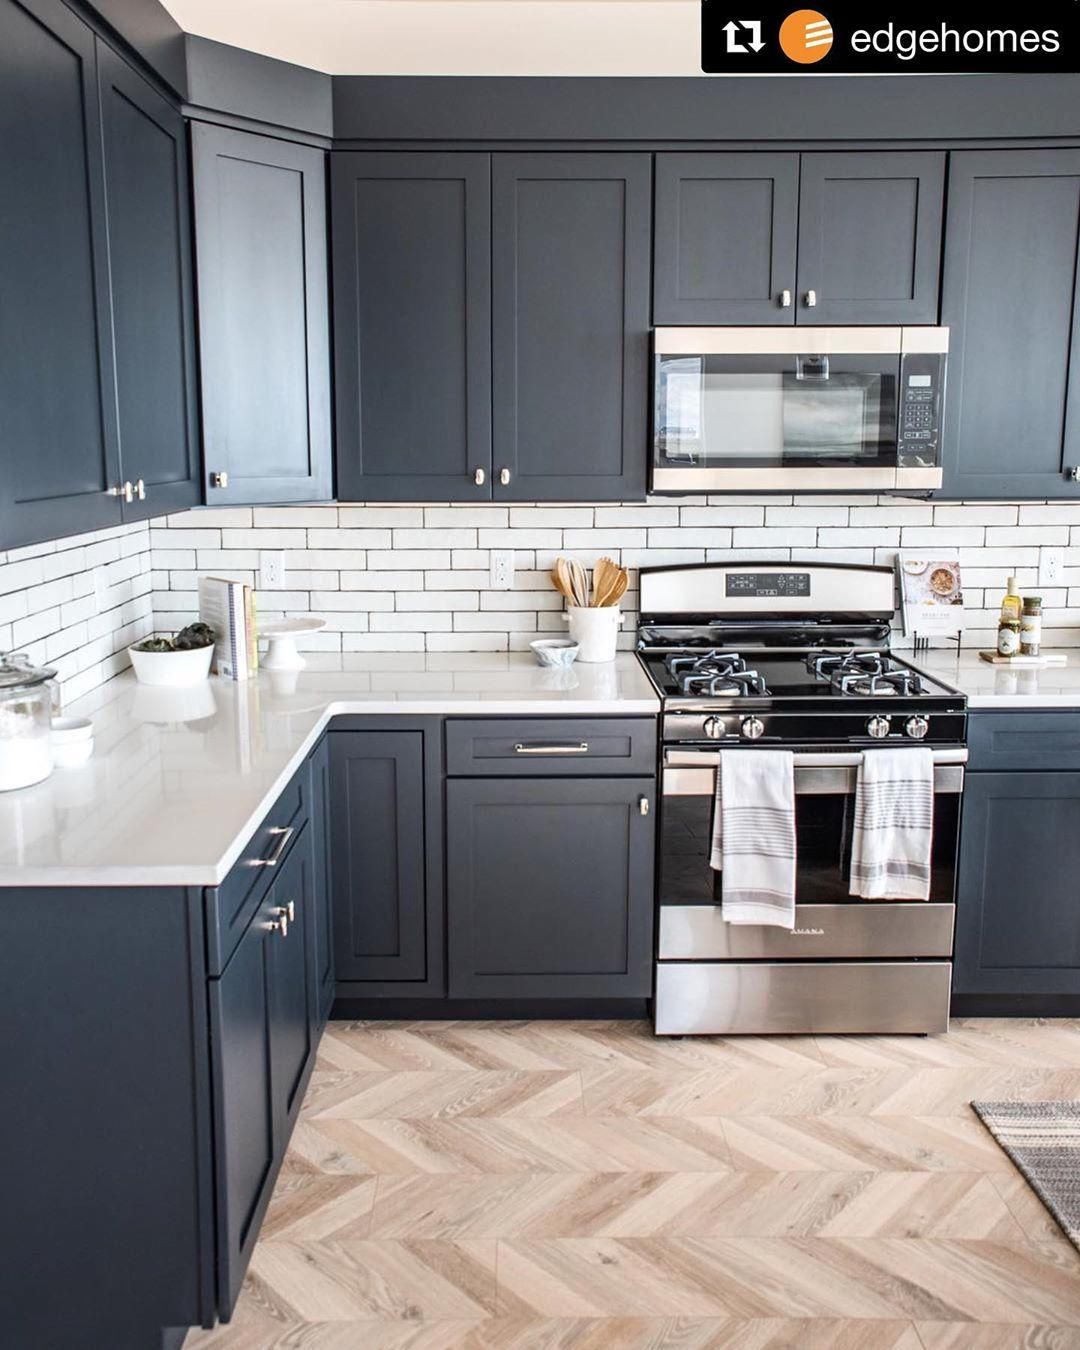 38 timeless kitchen cabinets units ideas make everything traceable timeless kitchen on kitchen id=71973